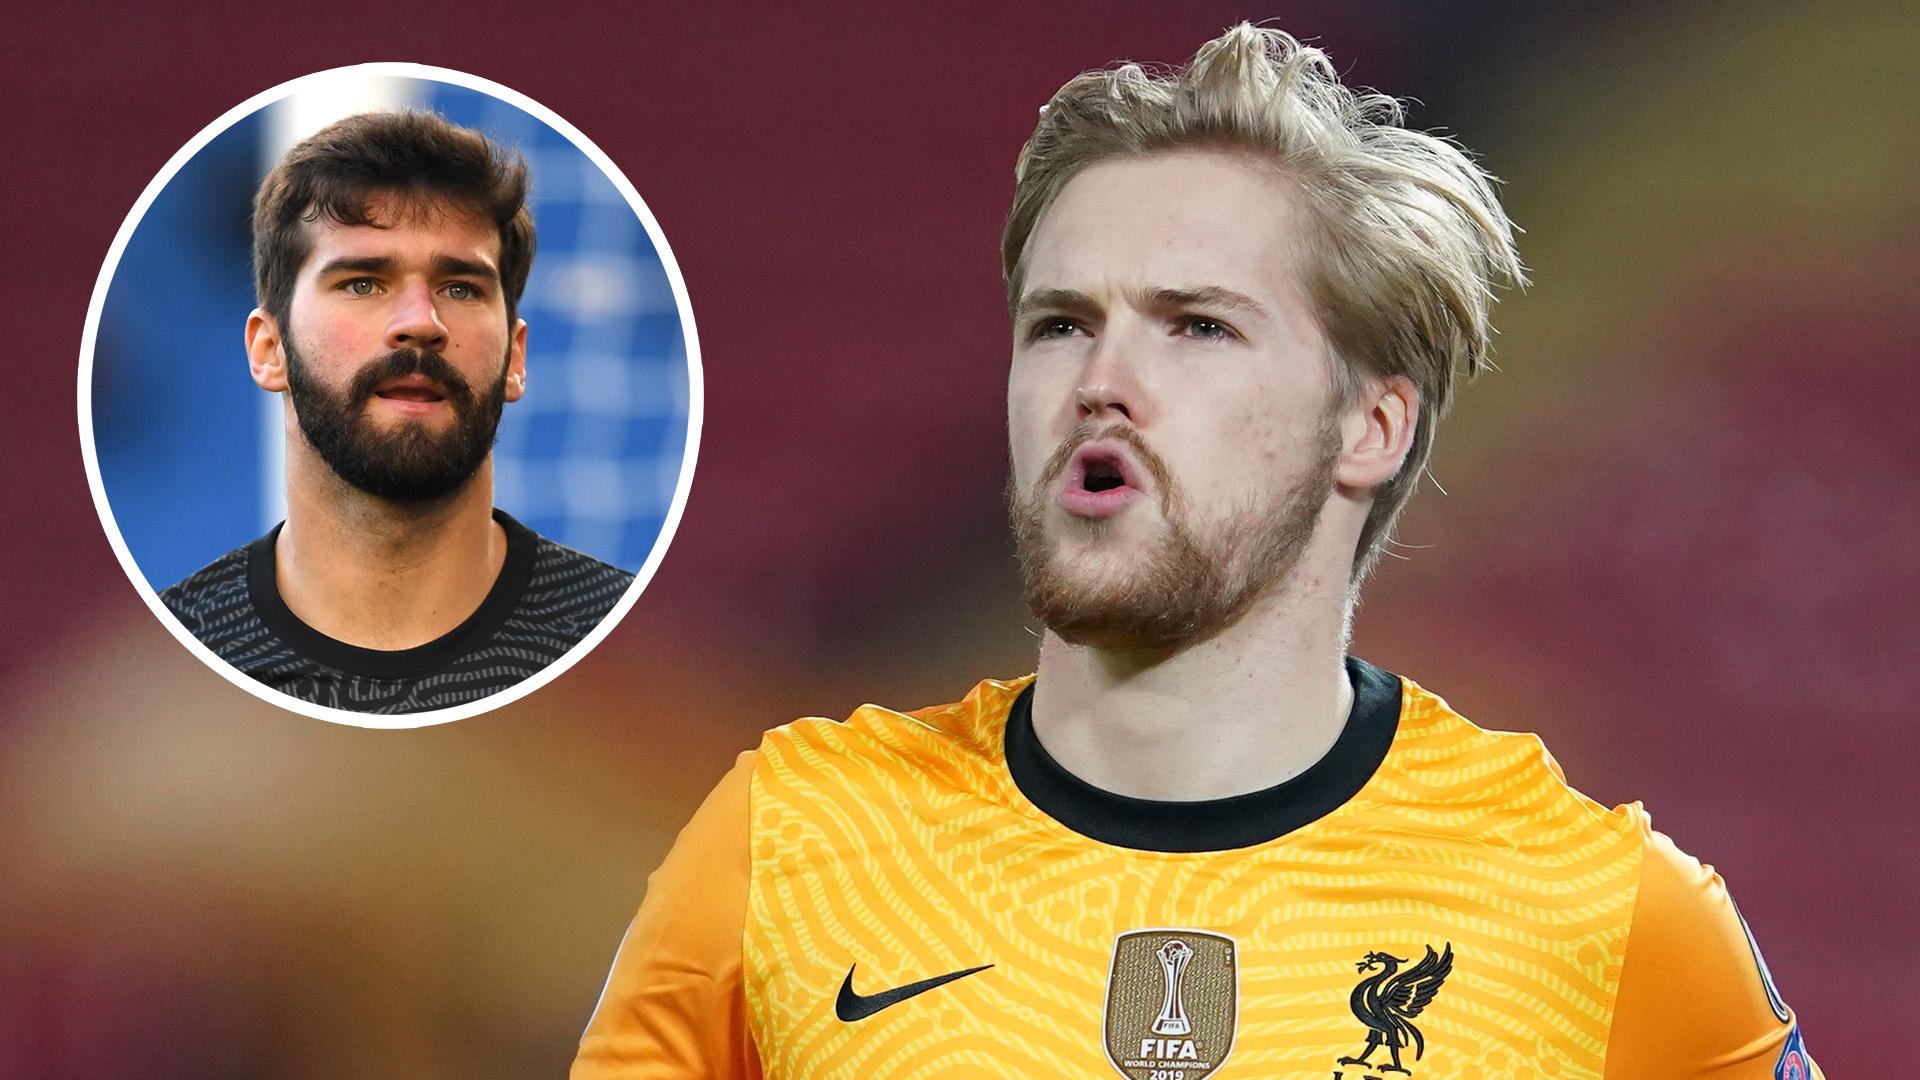 Jurgen Klopp confirms Liverpool have no new injuries ahead of Midtjylland clash